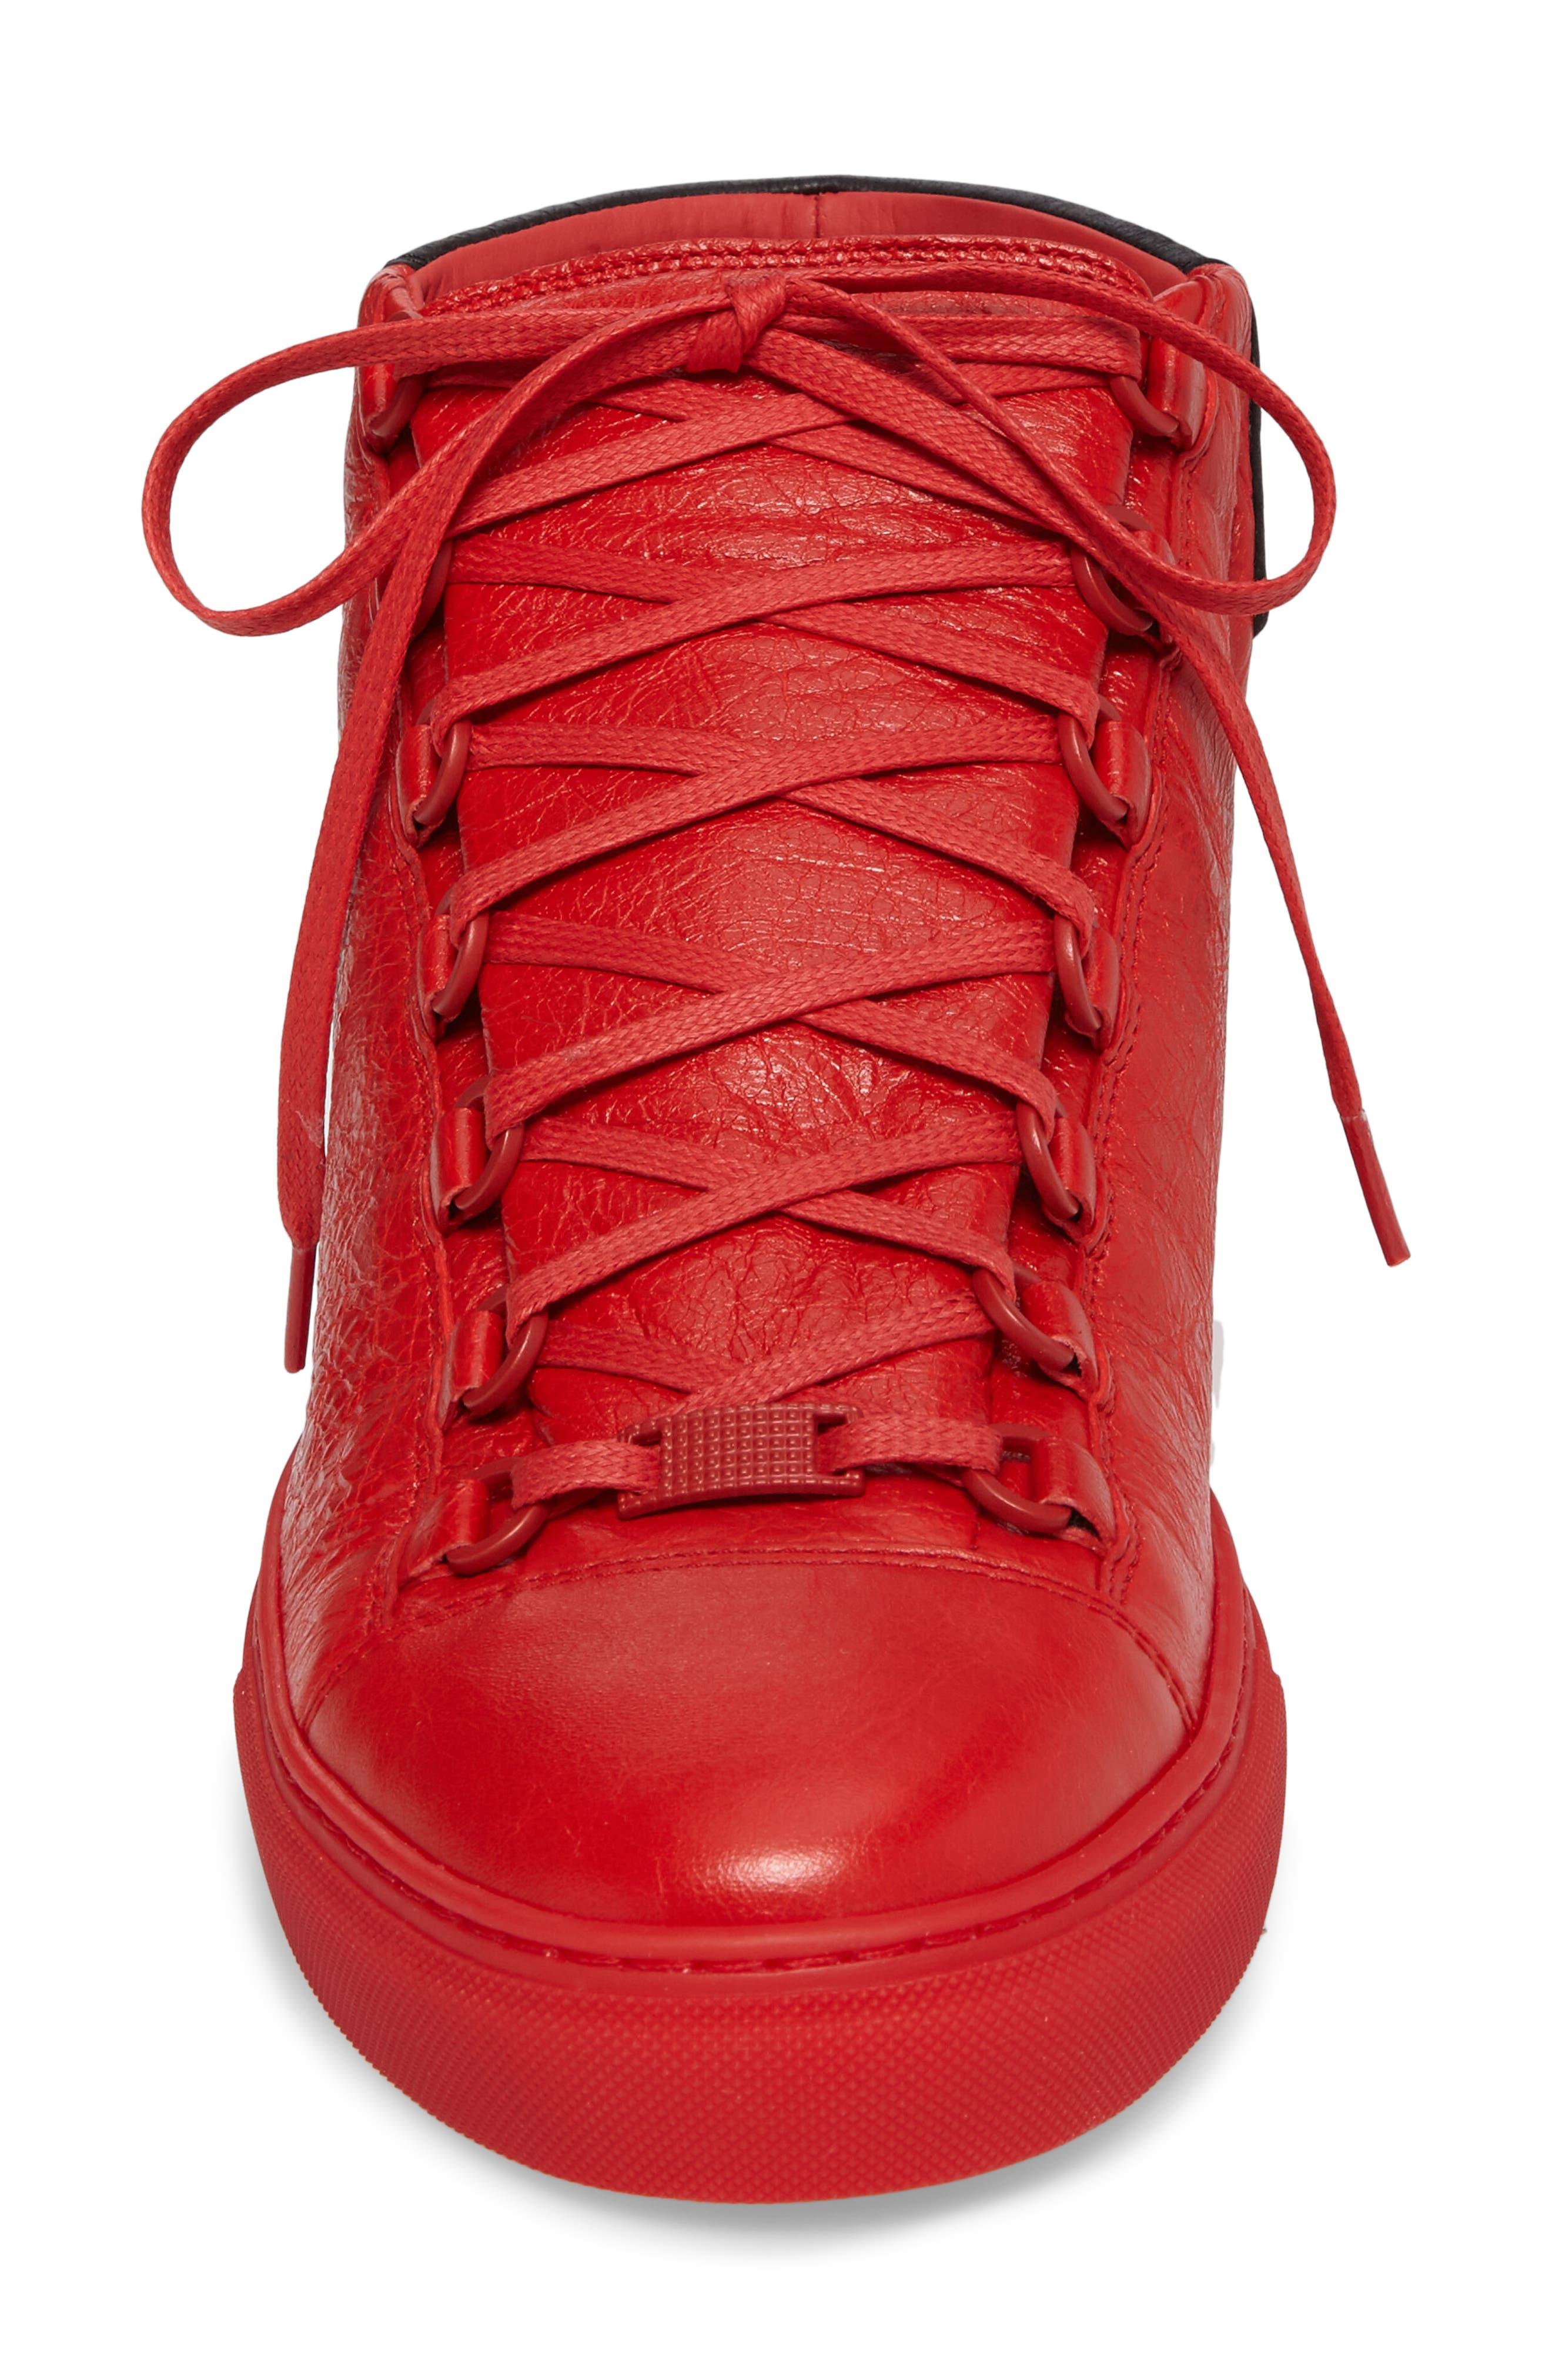 Arena High Sneaker,                             Alternate thumbnail 4, color,                             Rouge Paprika/ Noir Leather